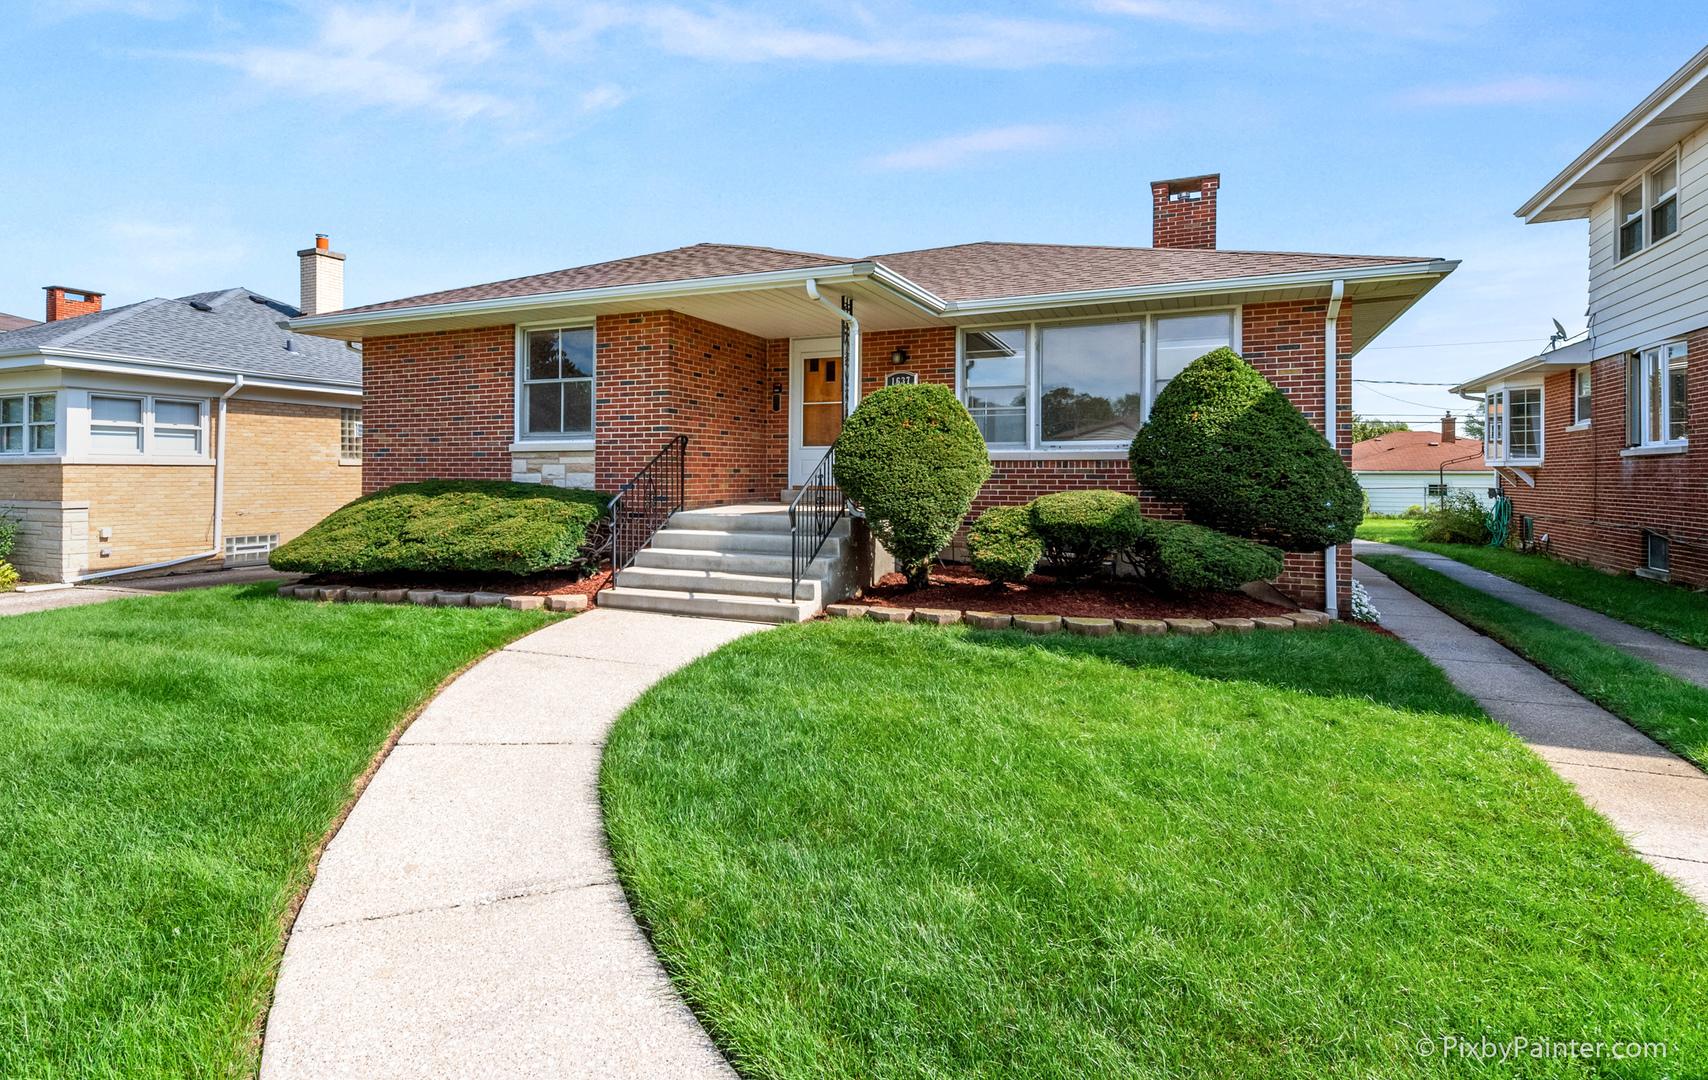 1637 Sunnyside, Westchester, Illinois, 60154